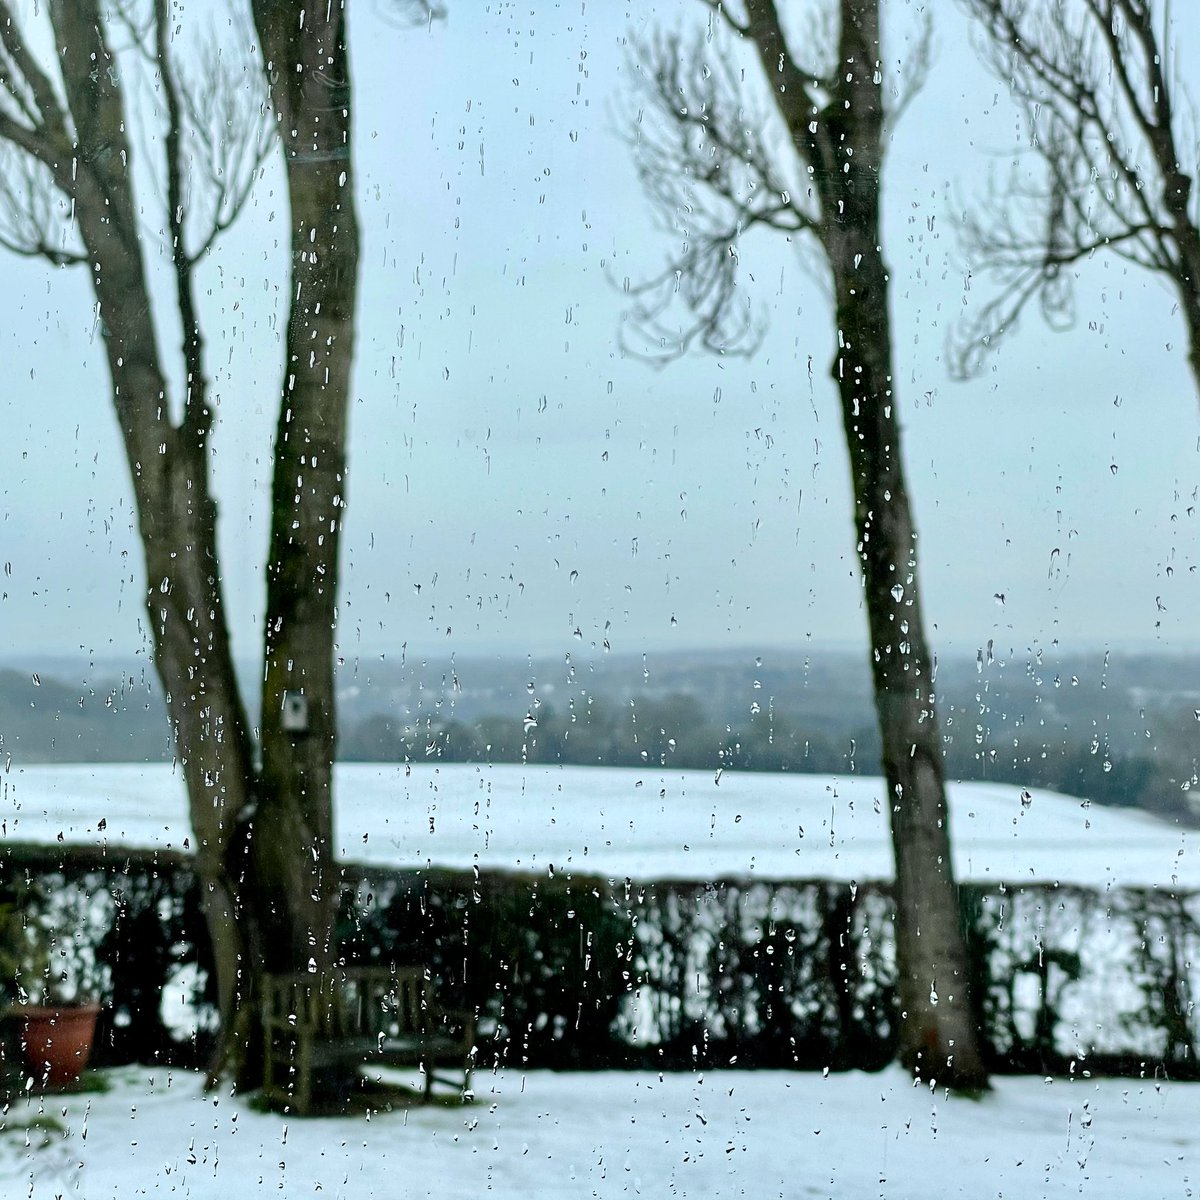 And so, it rains  #rain #raining #snow #snowy #snowyscene #snowydays #wet #wetweather #nikkilewisphotography #nikkilewisphotos #officeview #view #hertfordshire #hertslife #herts #lockdownlife #lockdown3 #lockdown #covid19life #covid19 #winter #winterscene #winterrain #countryside